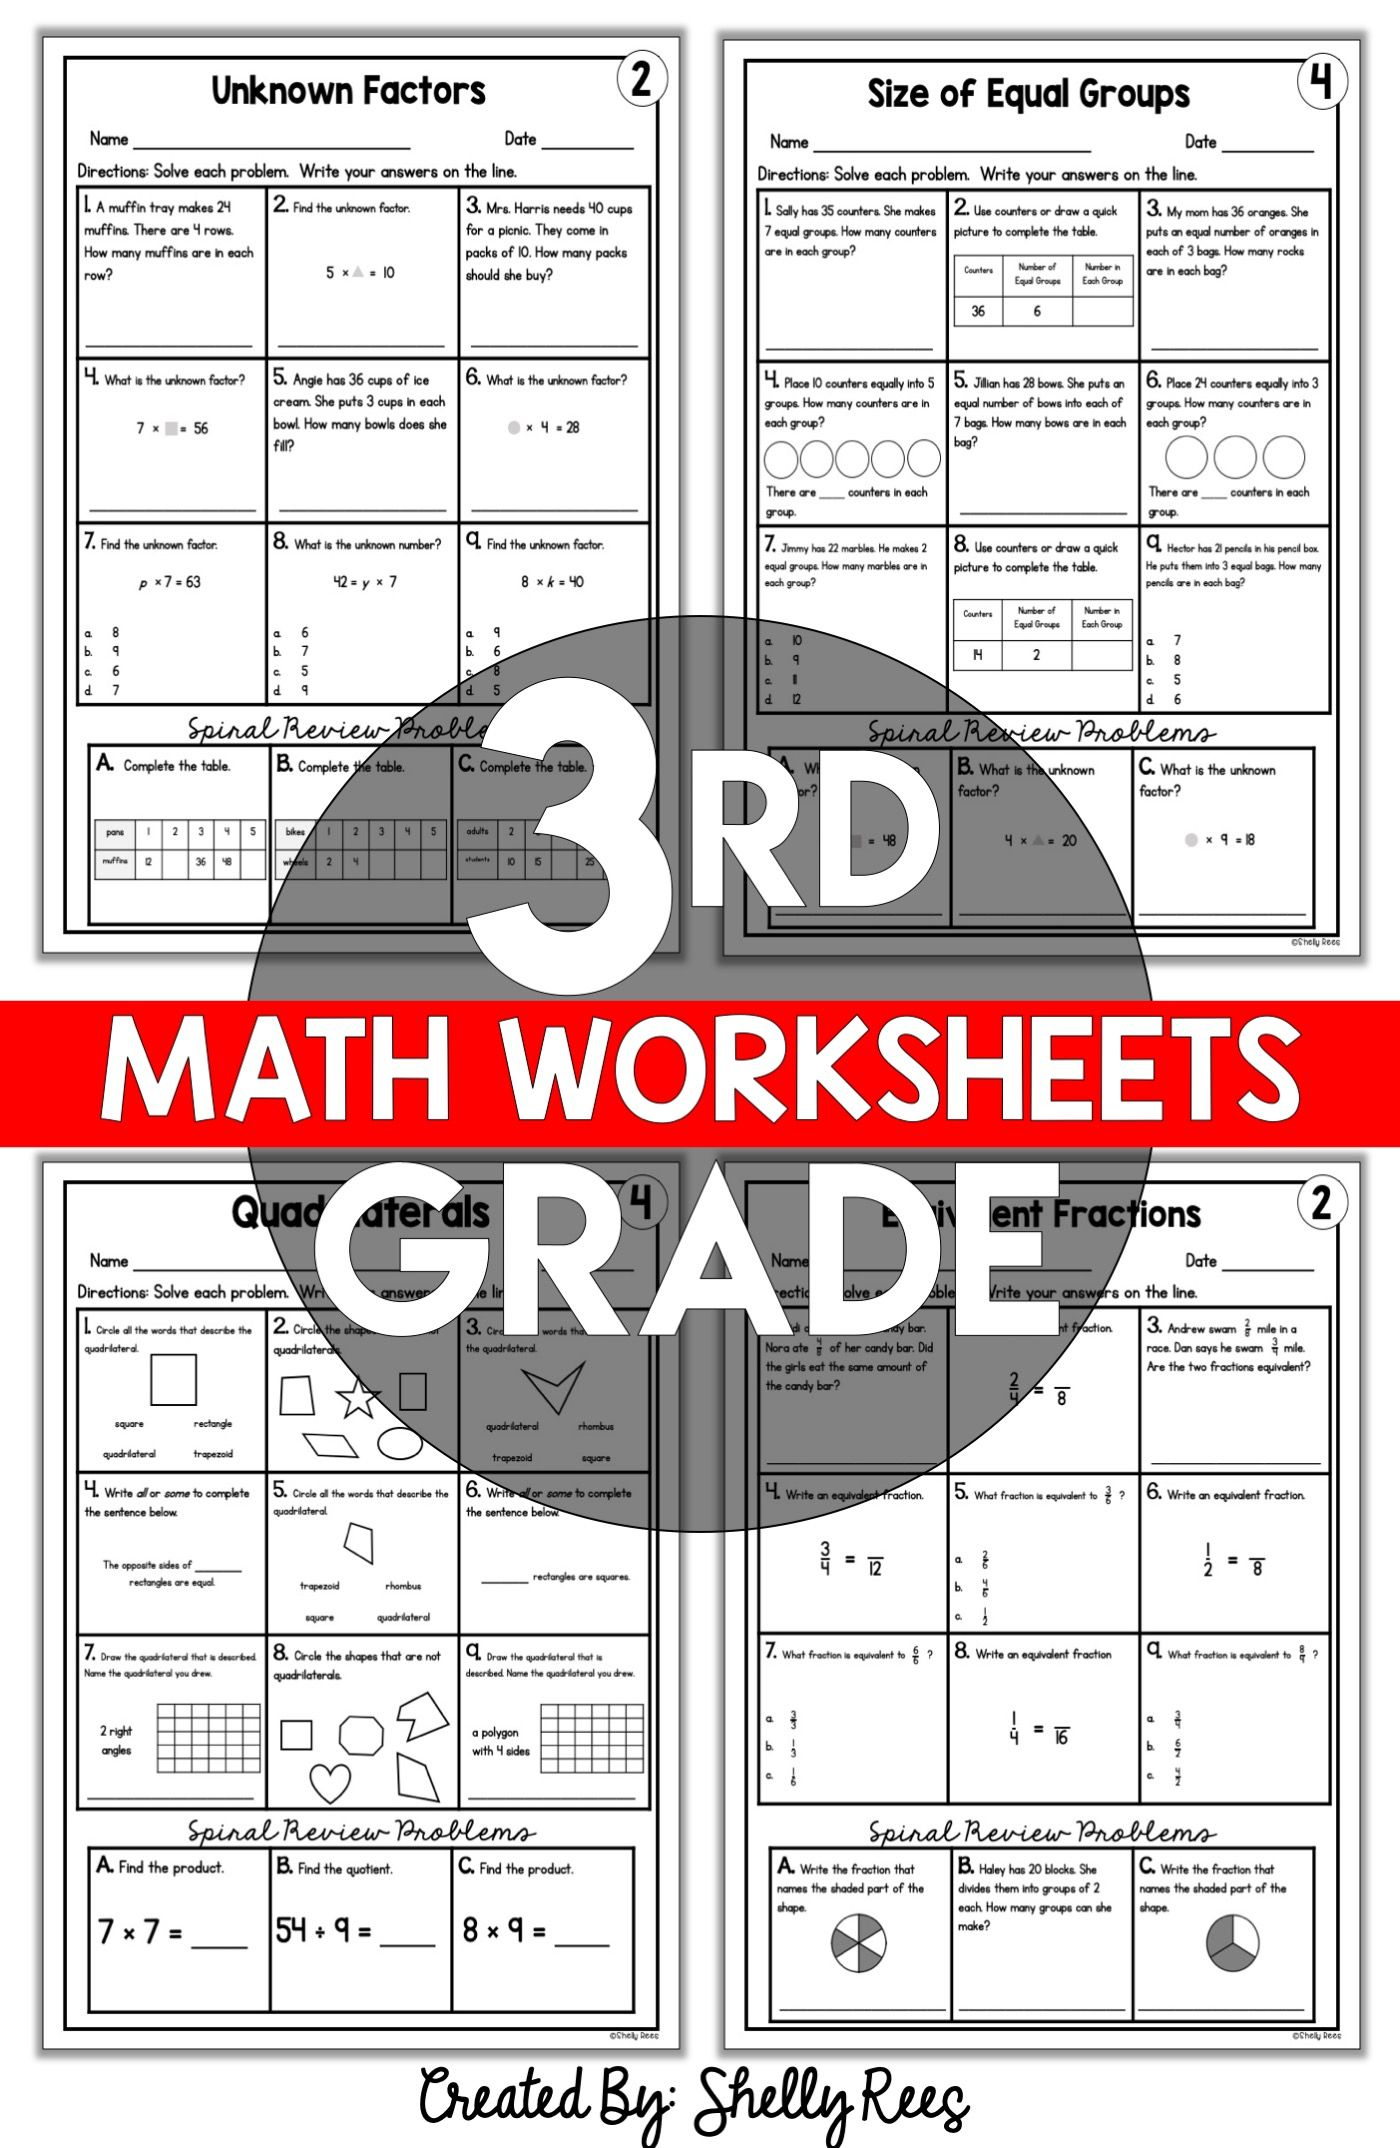 medium resolution of 3rd Grade Math Worksheets Free and Printable - Appletastic Learning   Math  worksheets